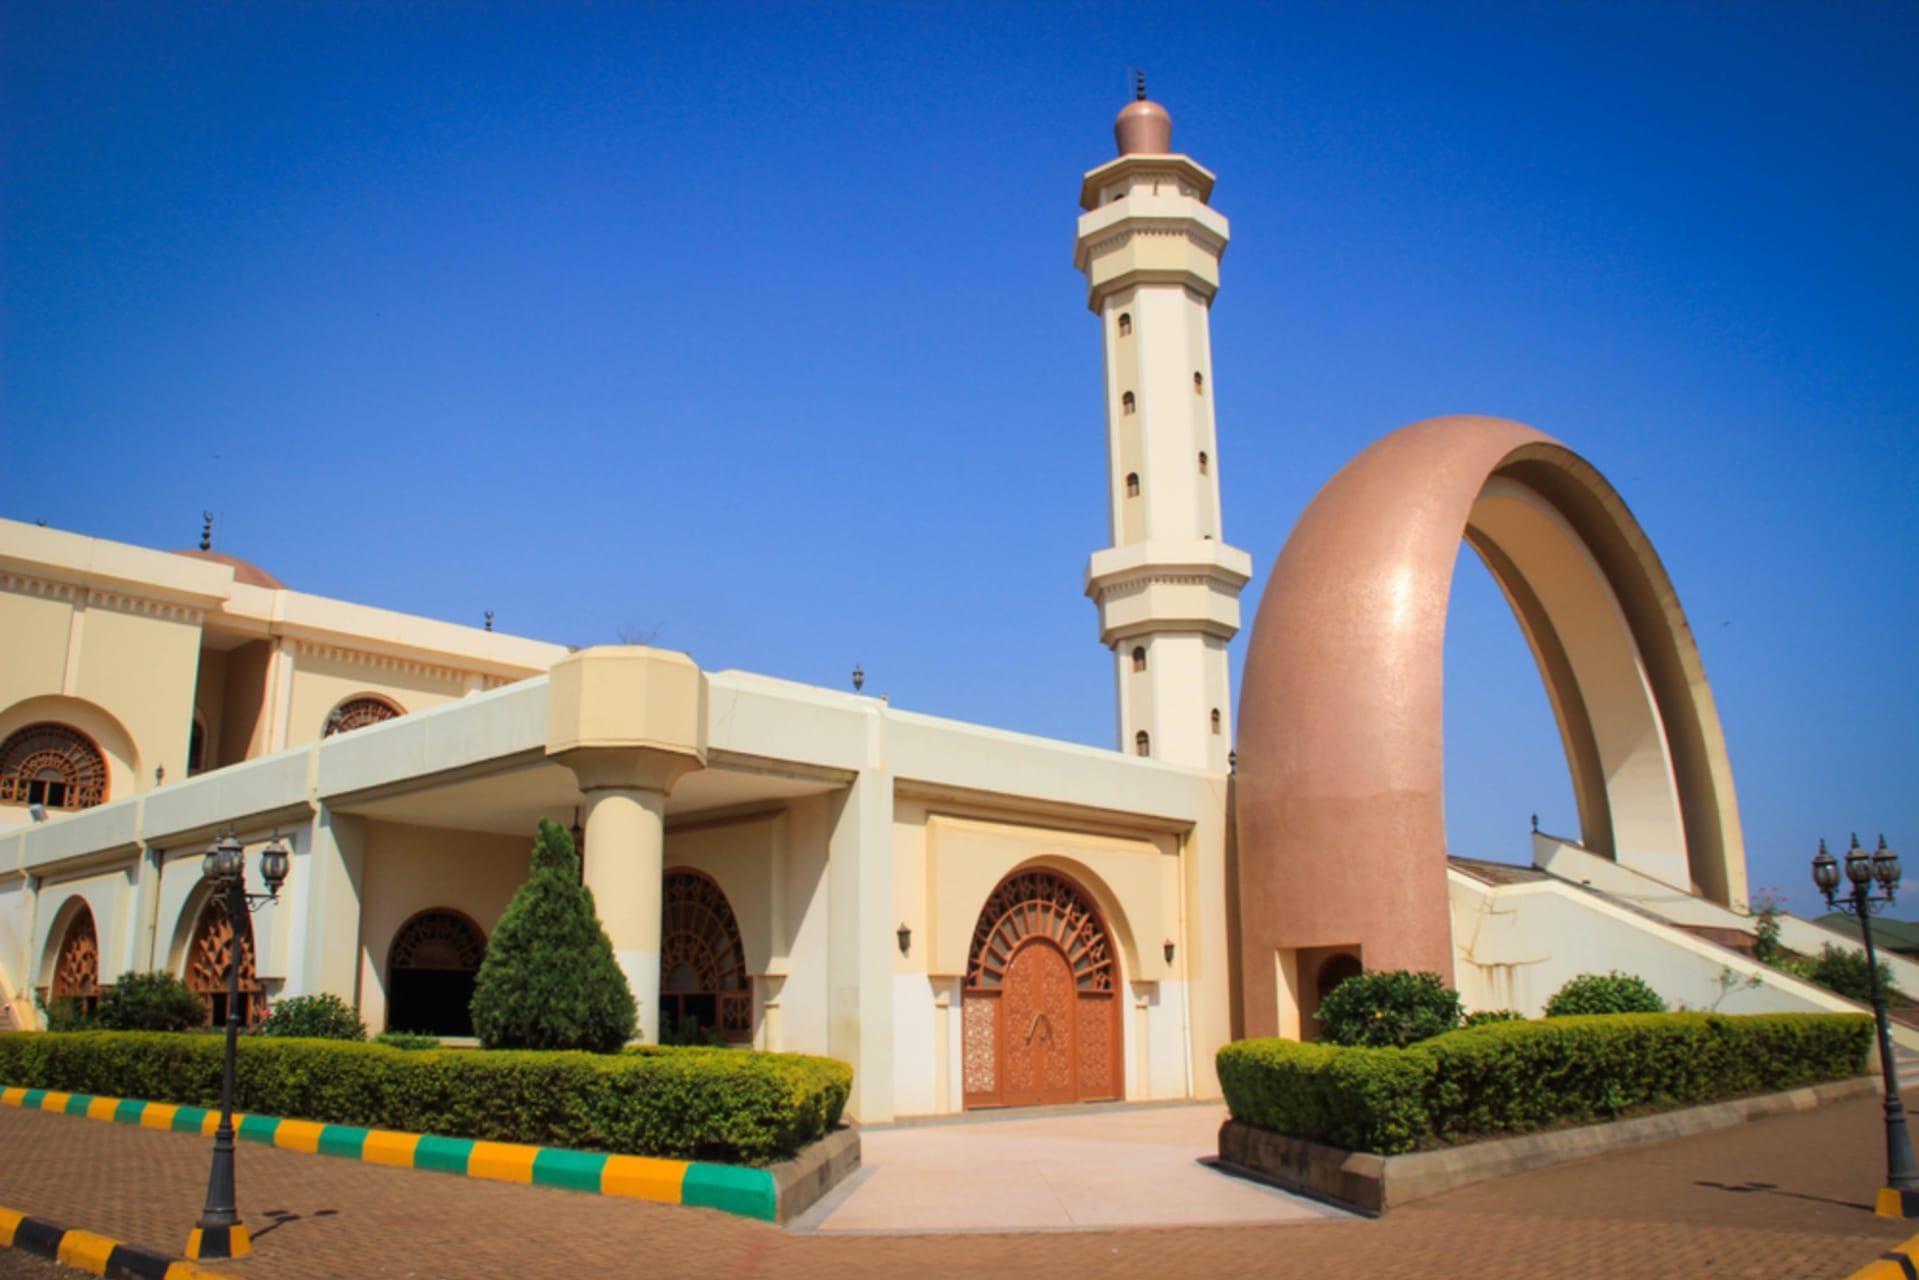 Kampala - The prominent Gaddafi National Mosque in Uganda.